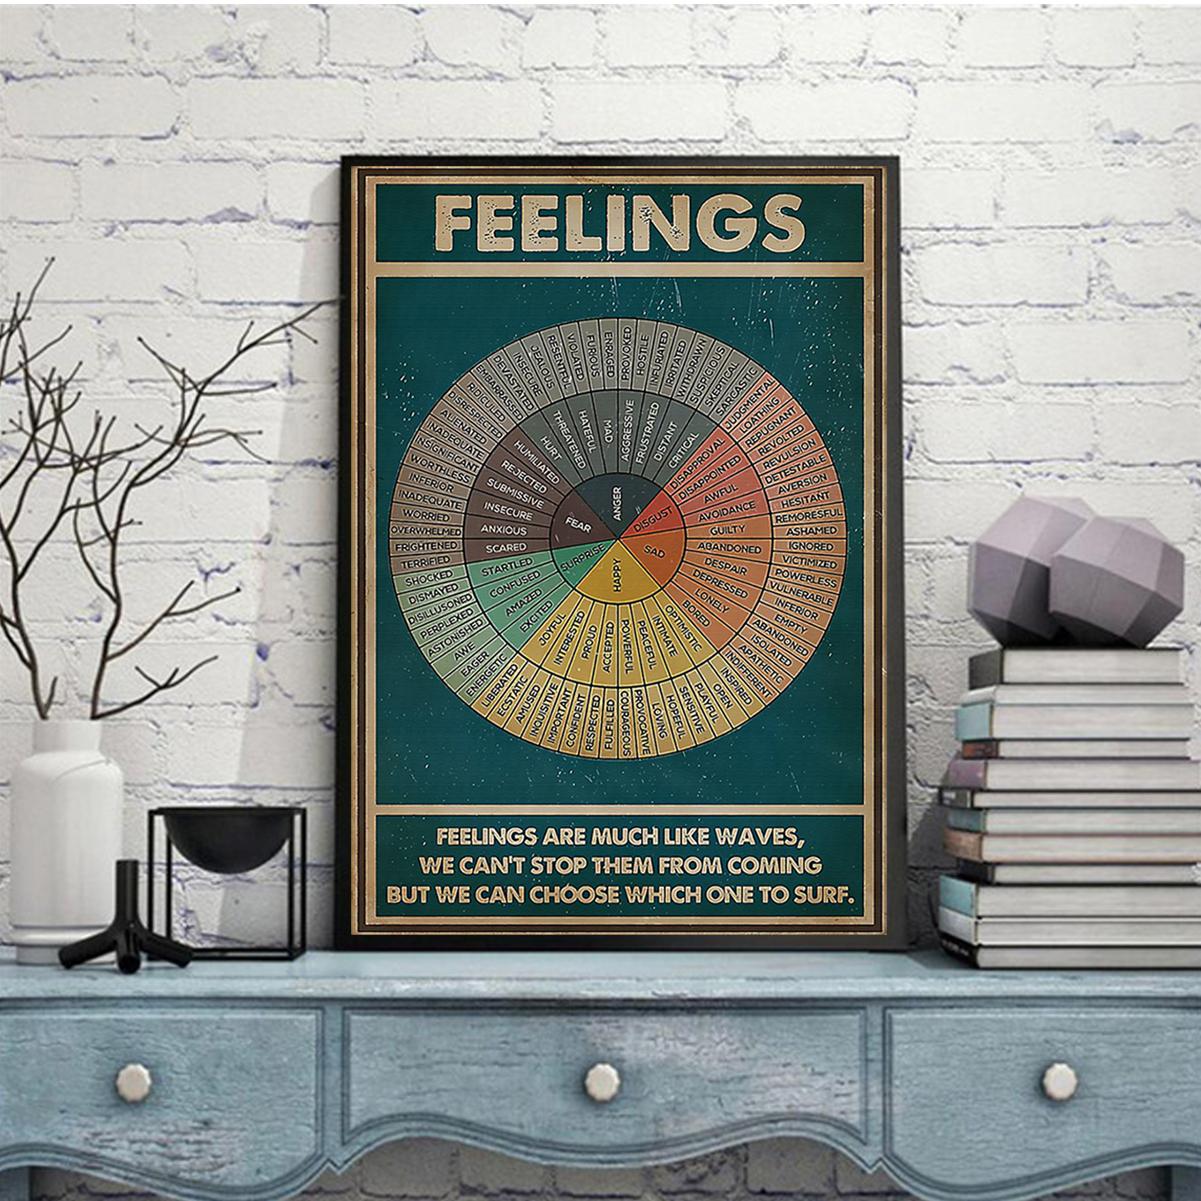 Social worker feelings poster A2